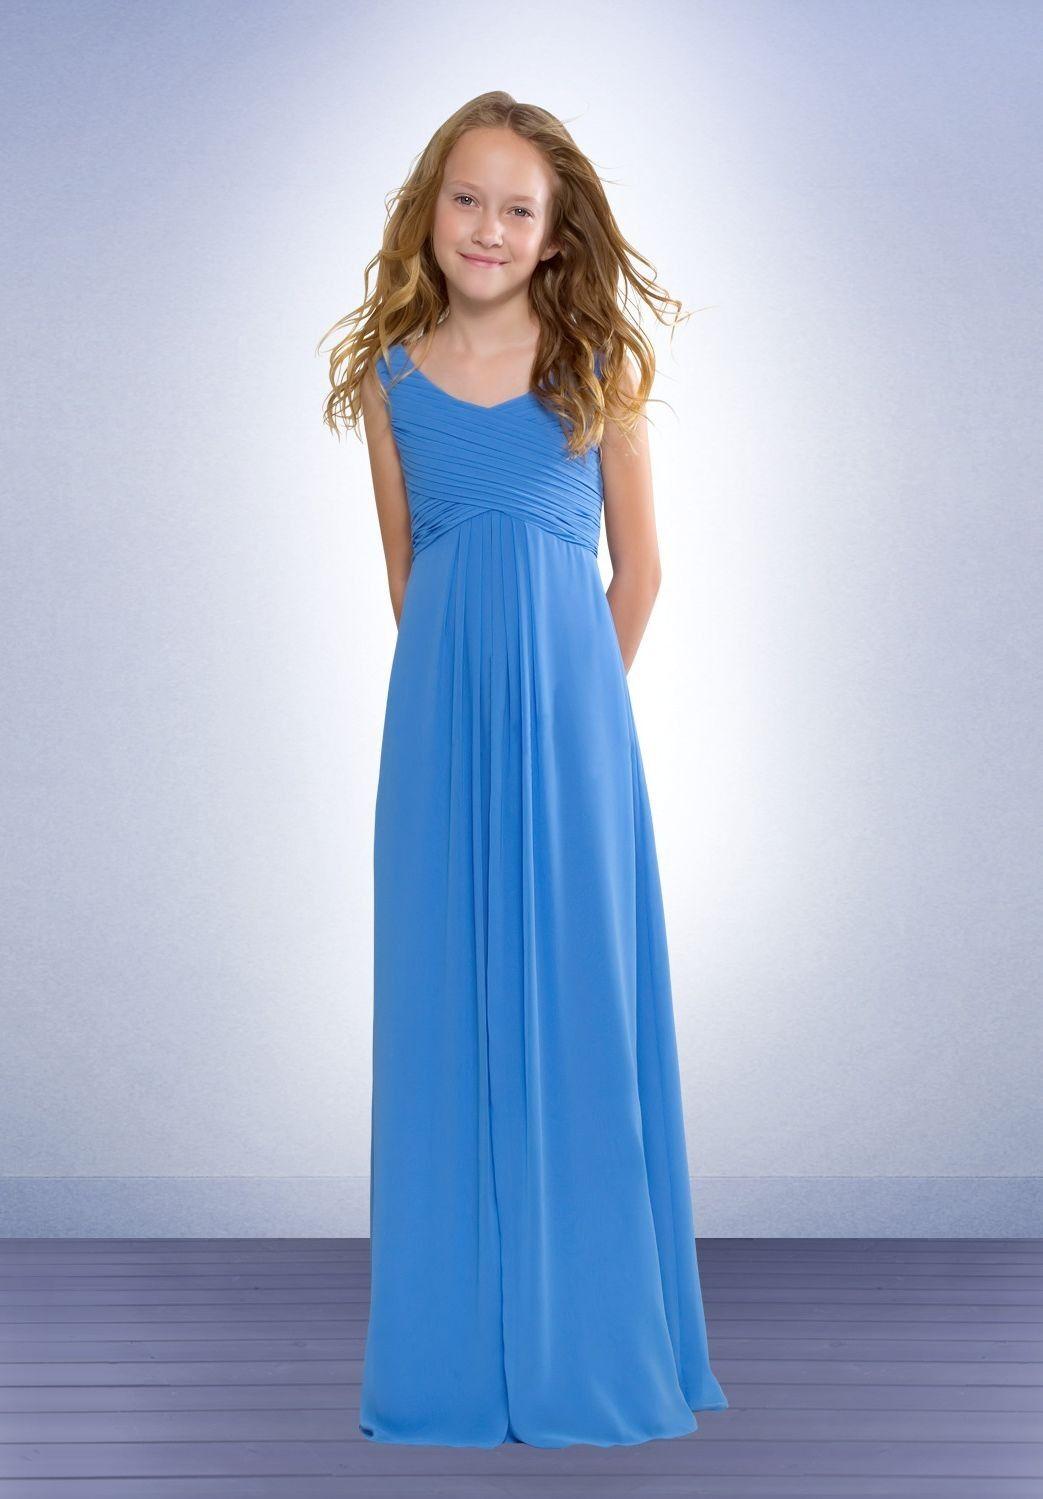 1000  images about Junior Bridesmaid Dresses on Pinterest  Junior ...